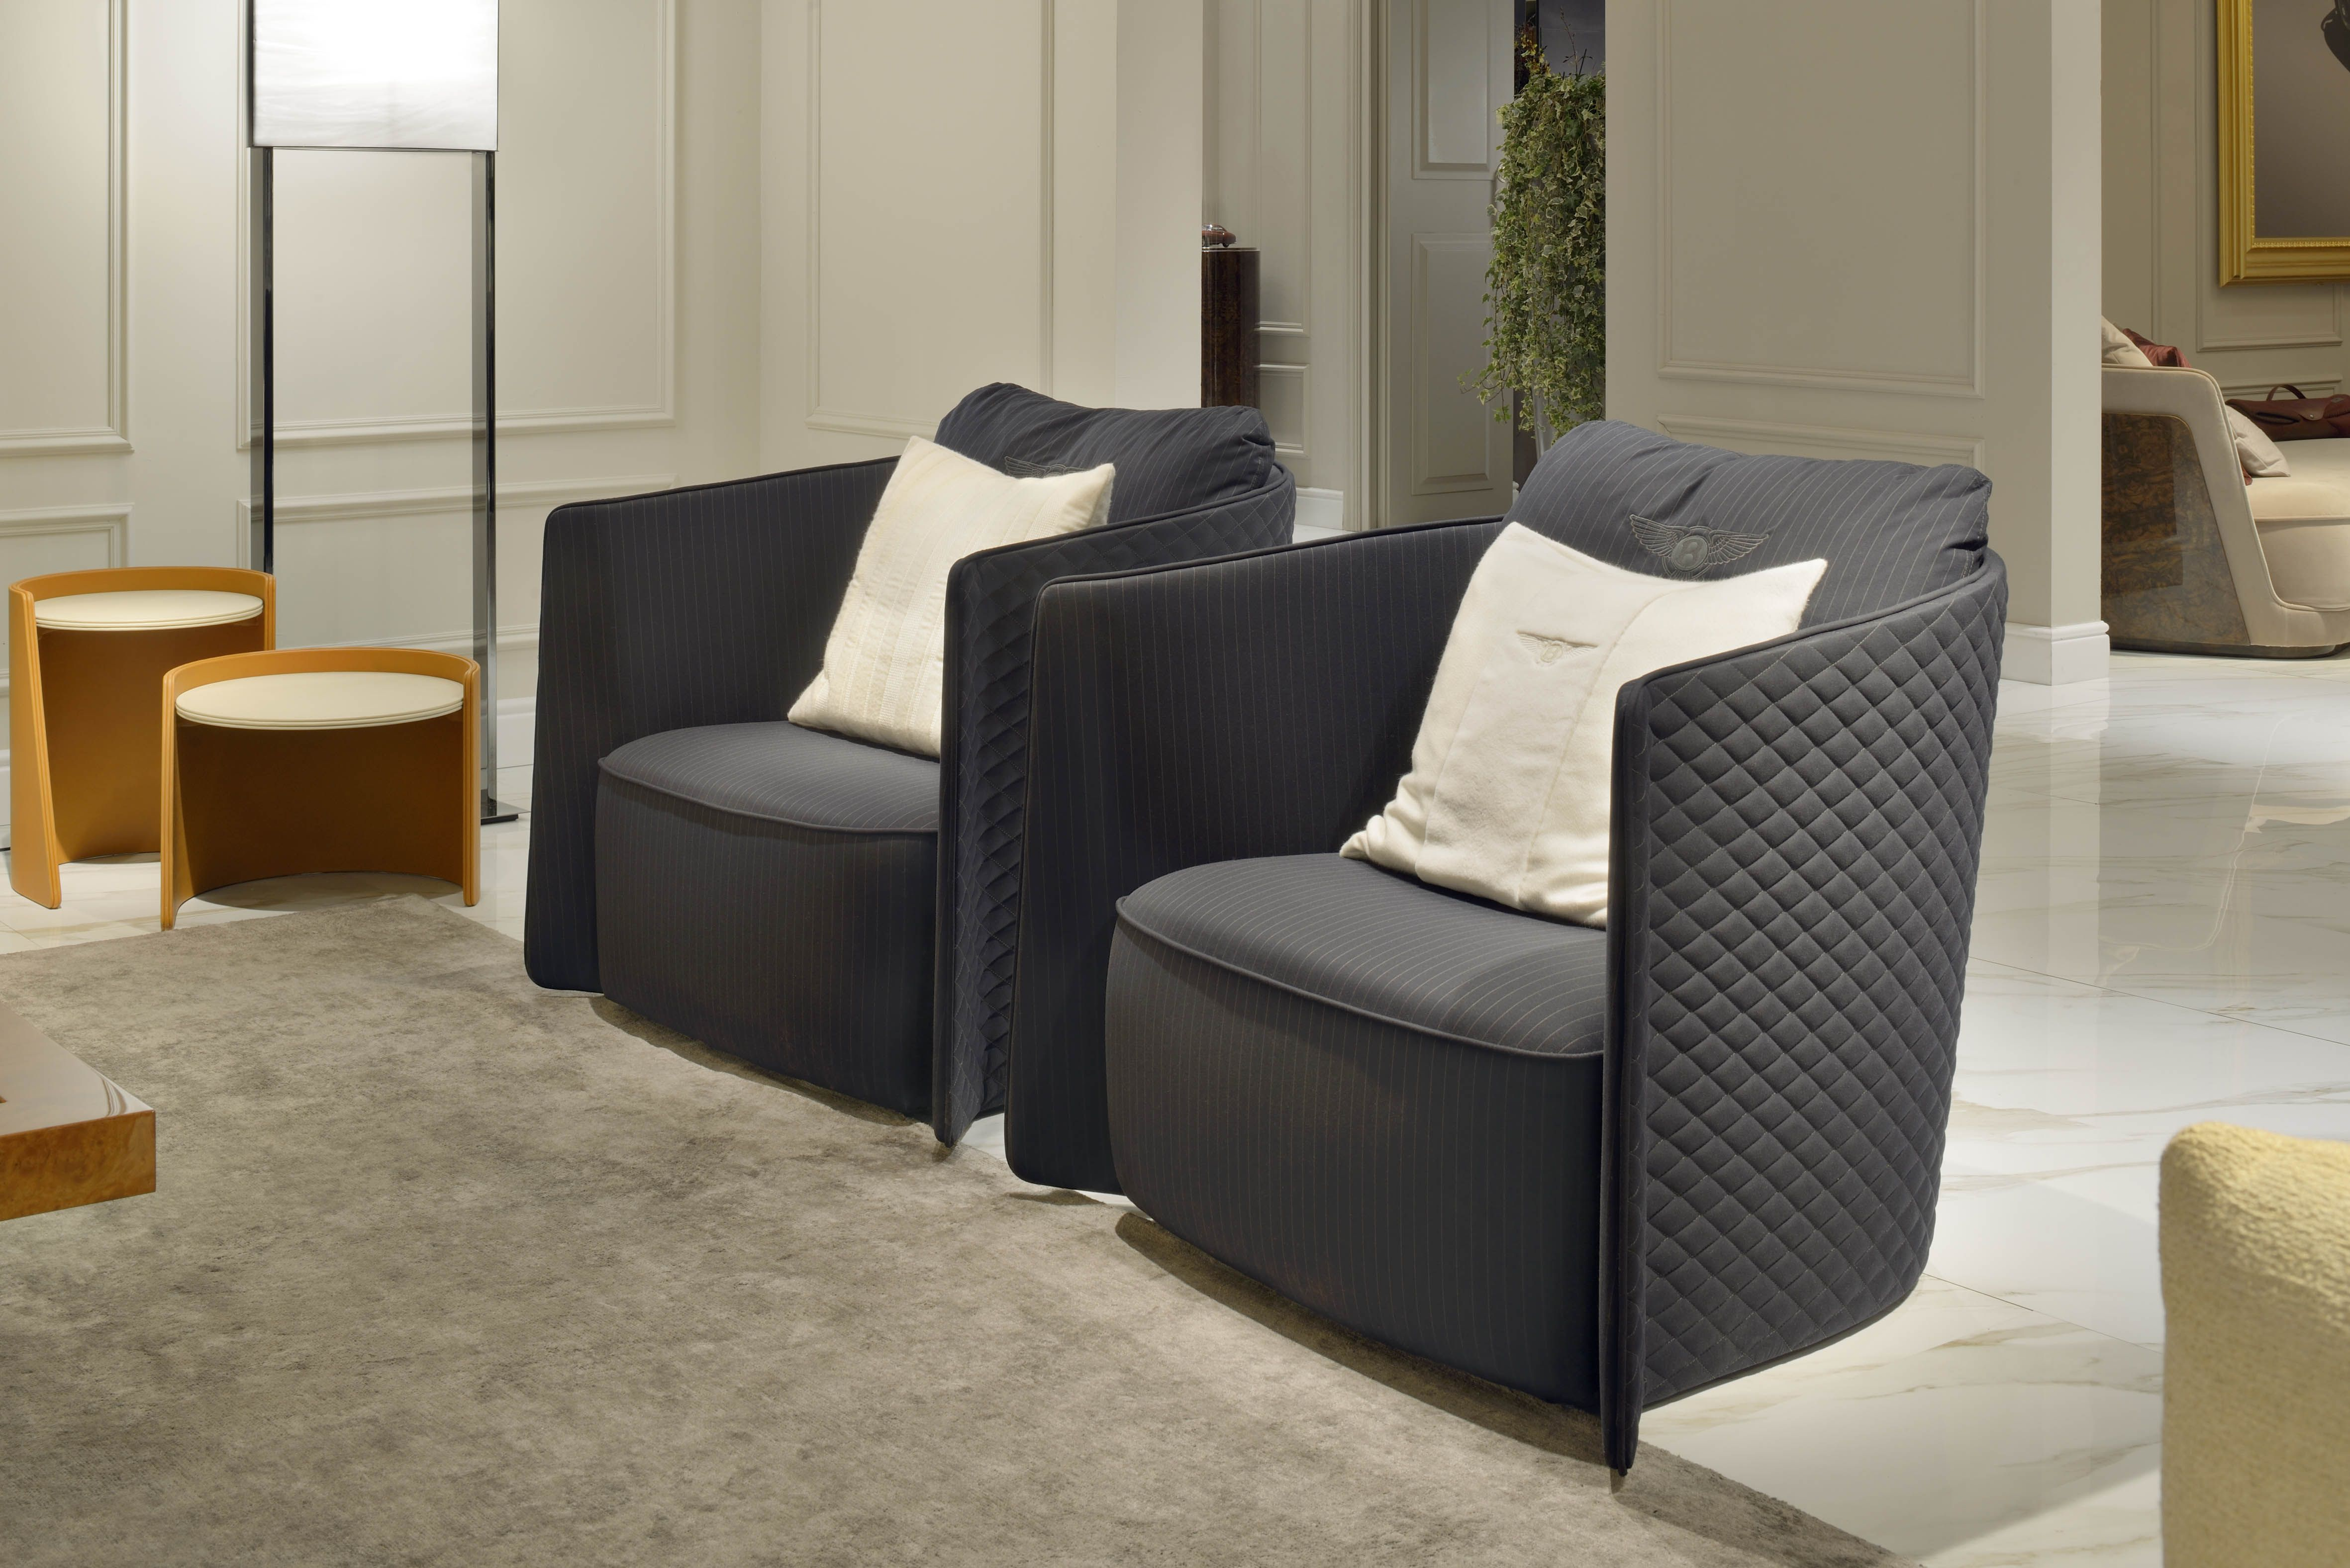 bentley recliner sofa loveseat and armchair set diy outdoor bed home collection pinterest